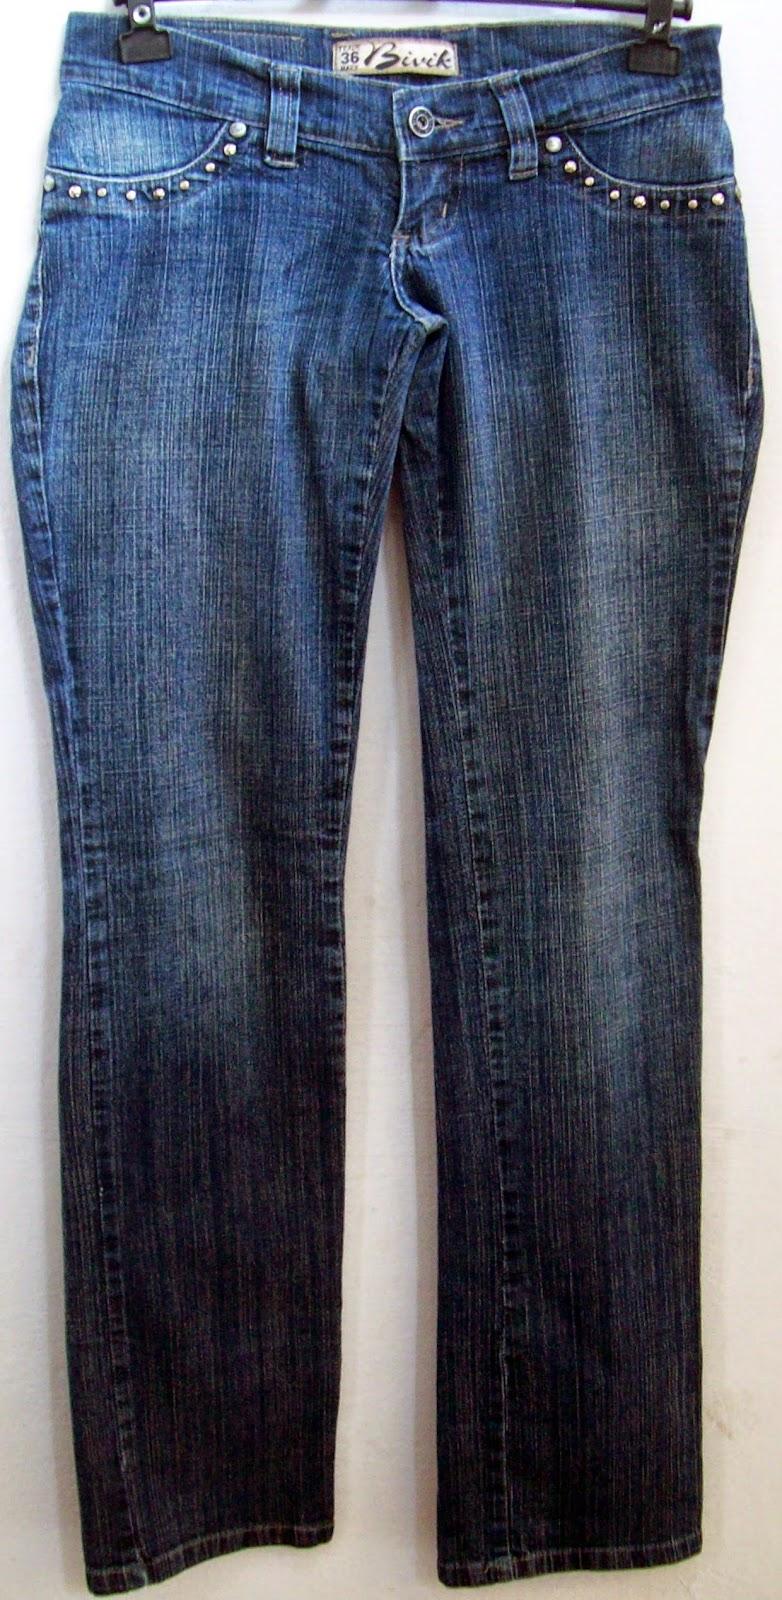 calça jeans Bivik tamanho 36